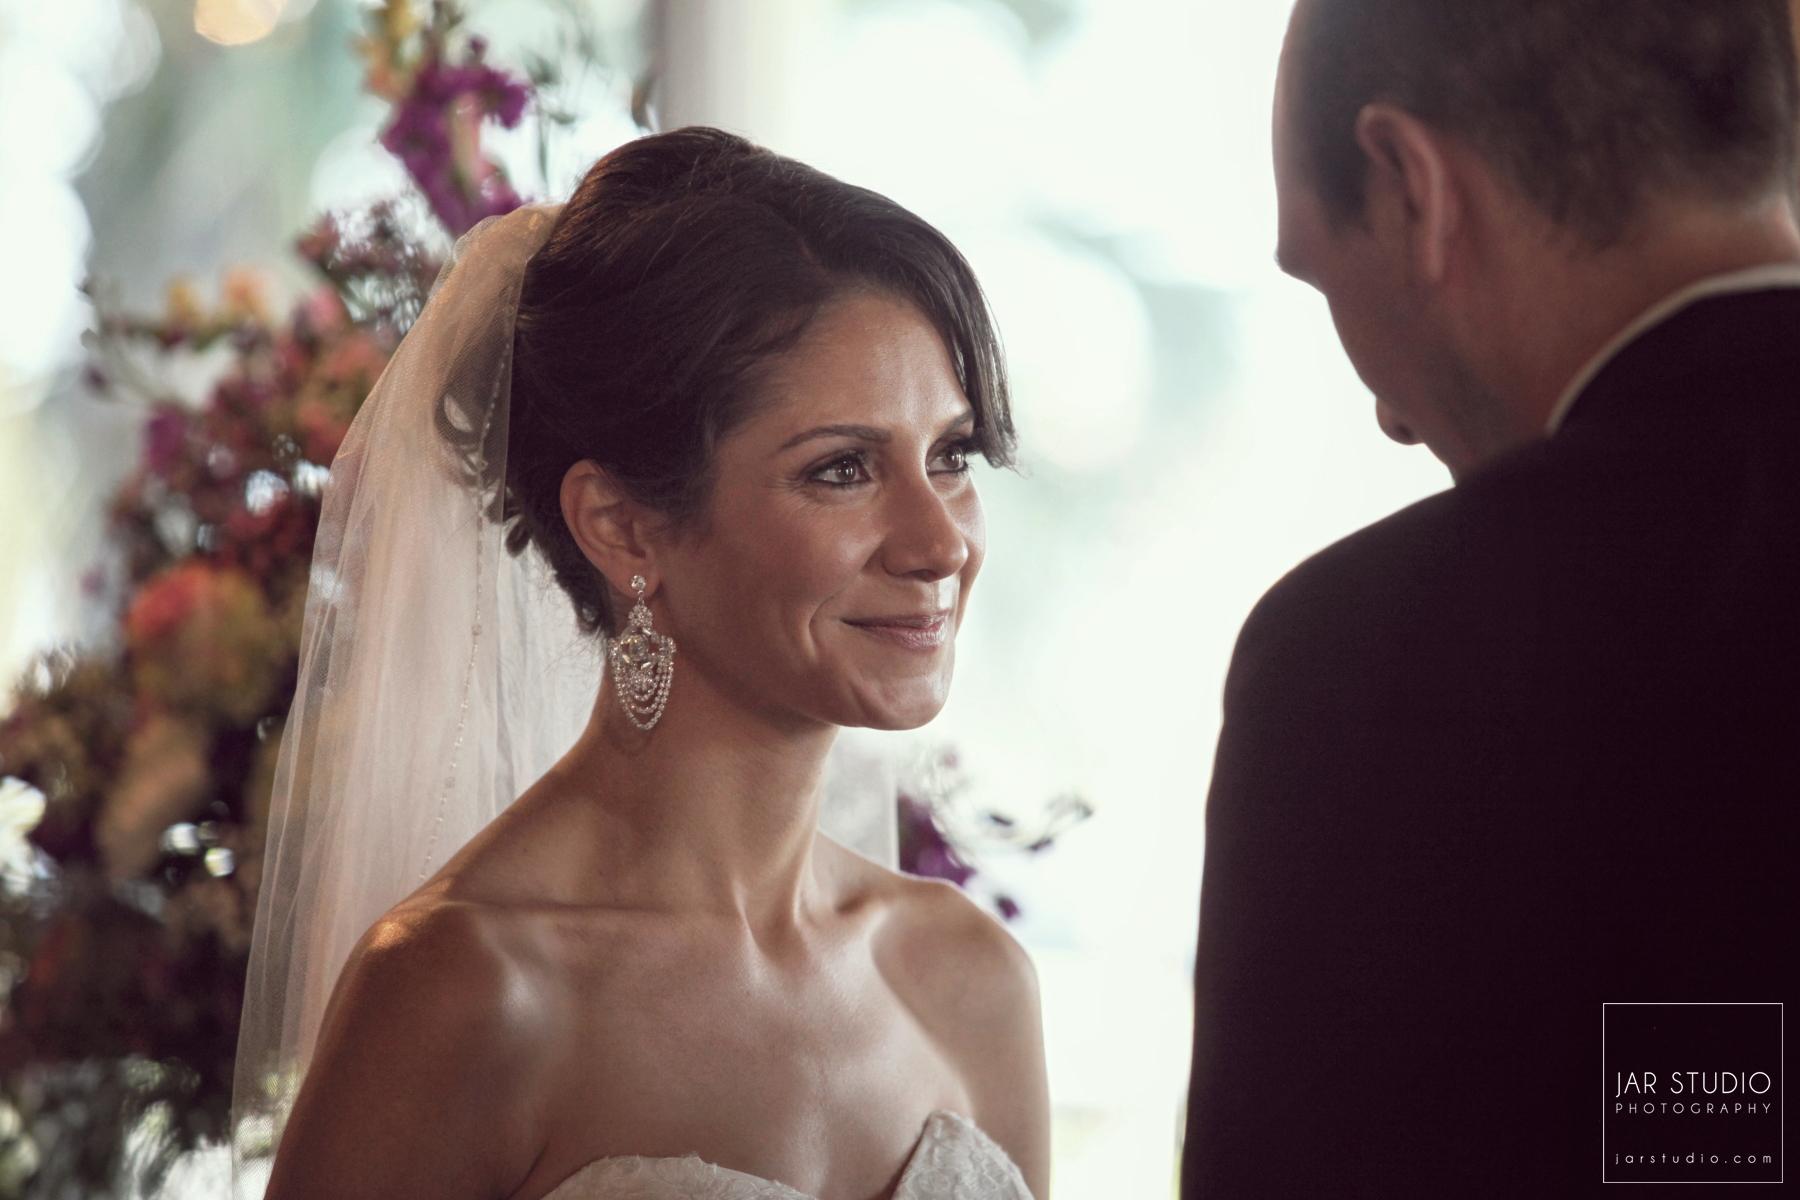 14-wedding-ceremony-the-grand-ballroom-white-room-jarstudio.JPG